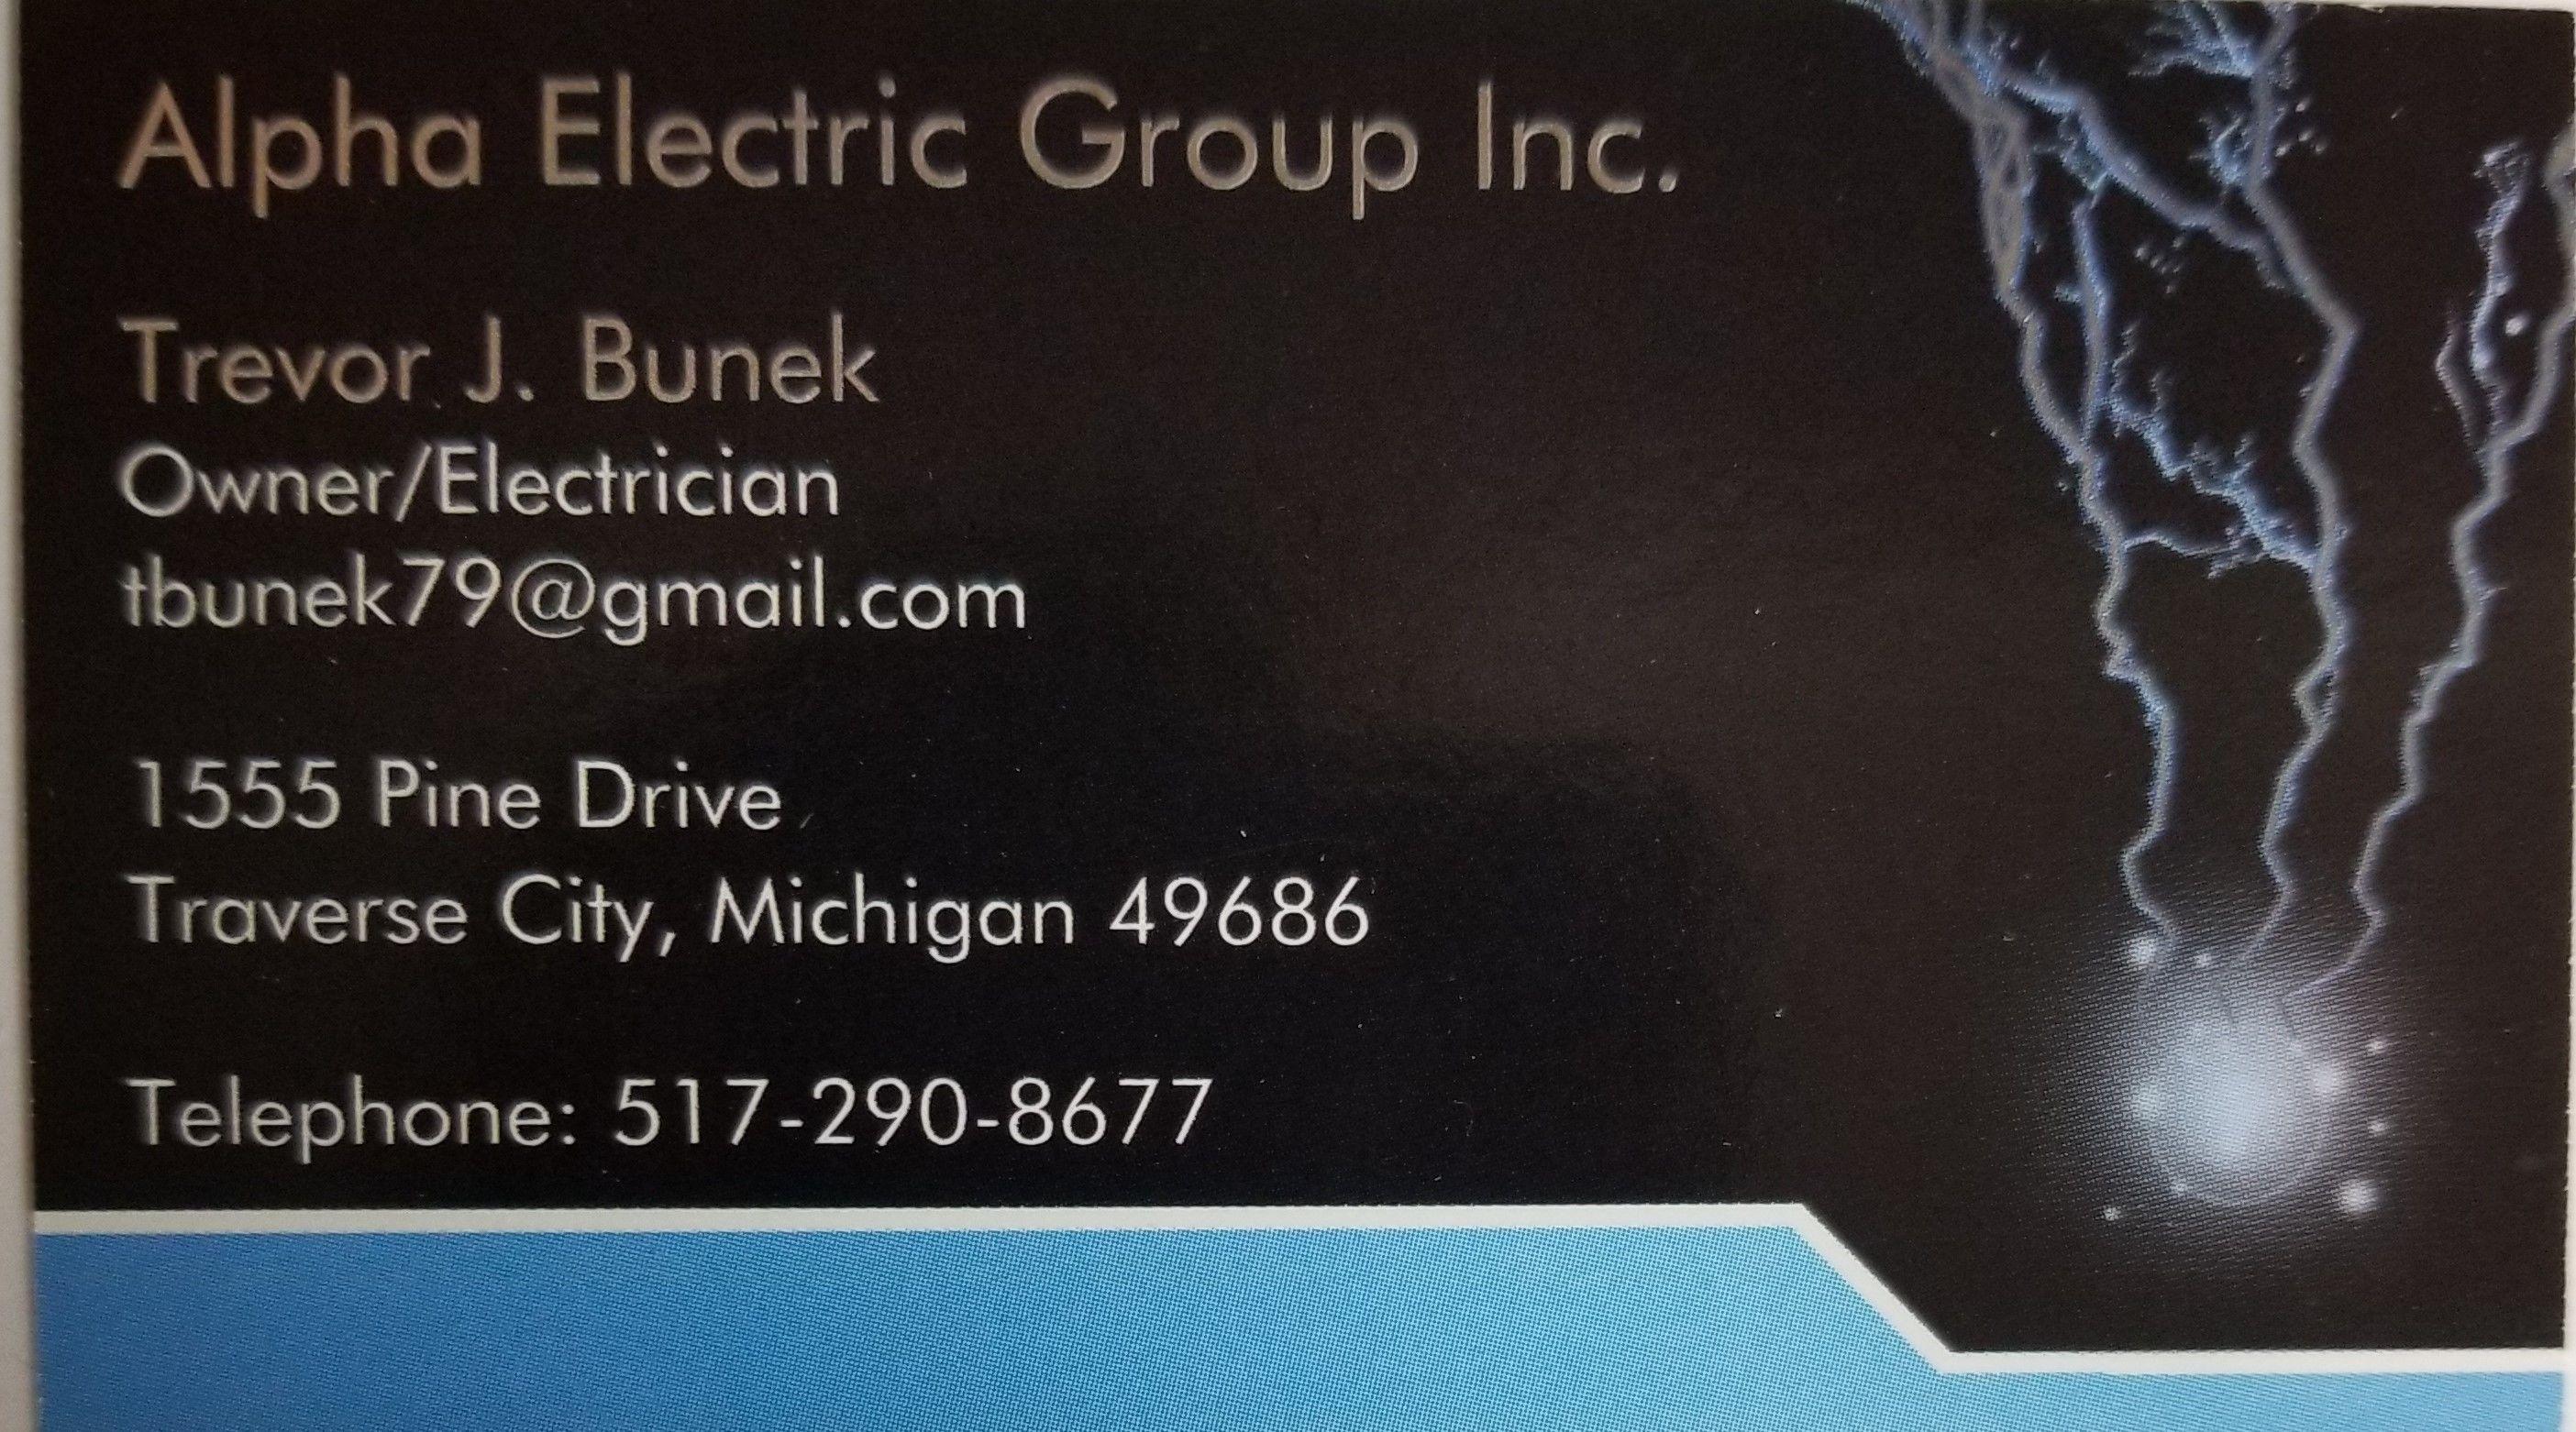 Alpha Electric Group Inc. image 1